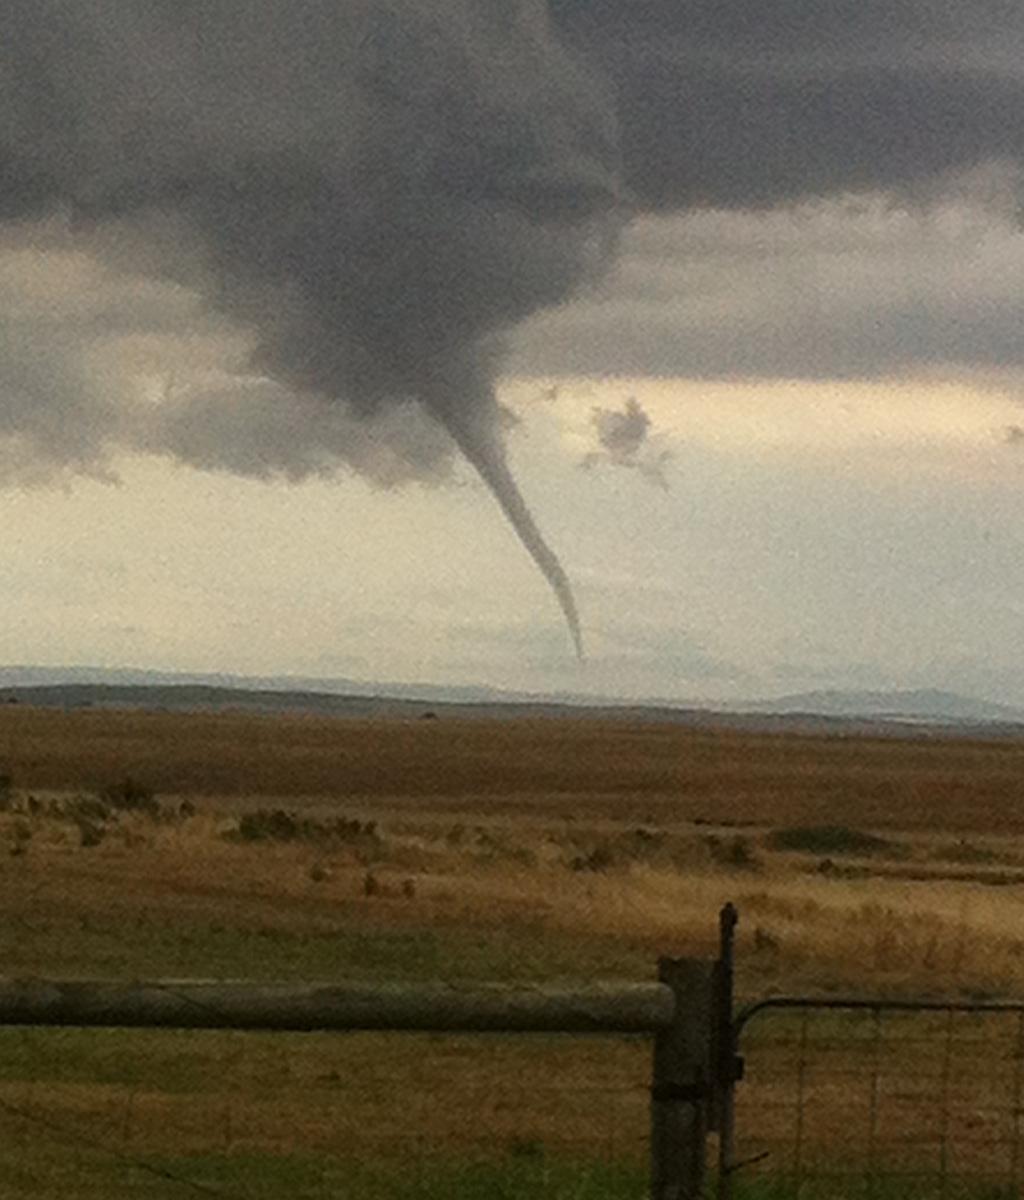 Tornado touches down in Adelaide Hills as wild weather tears through South Australia